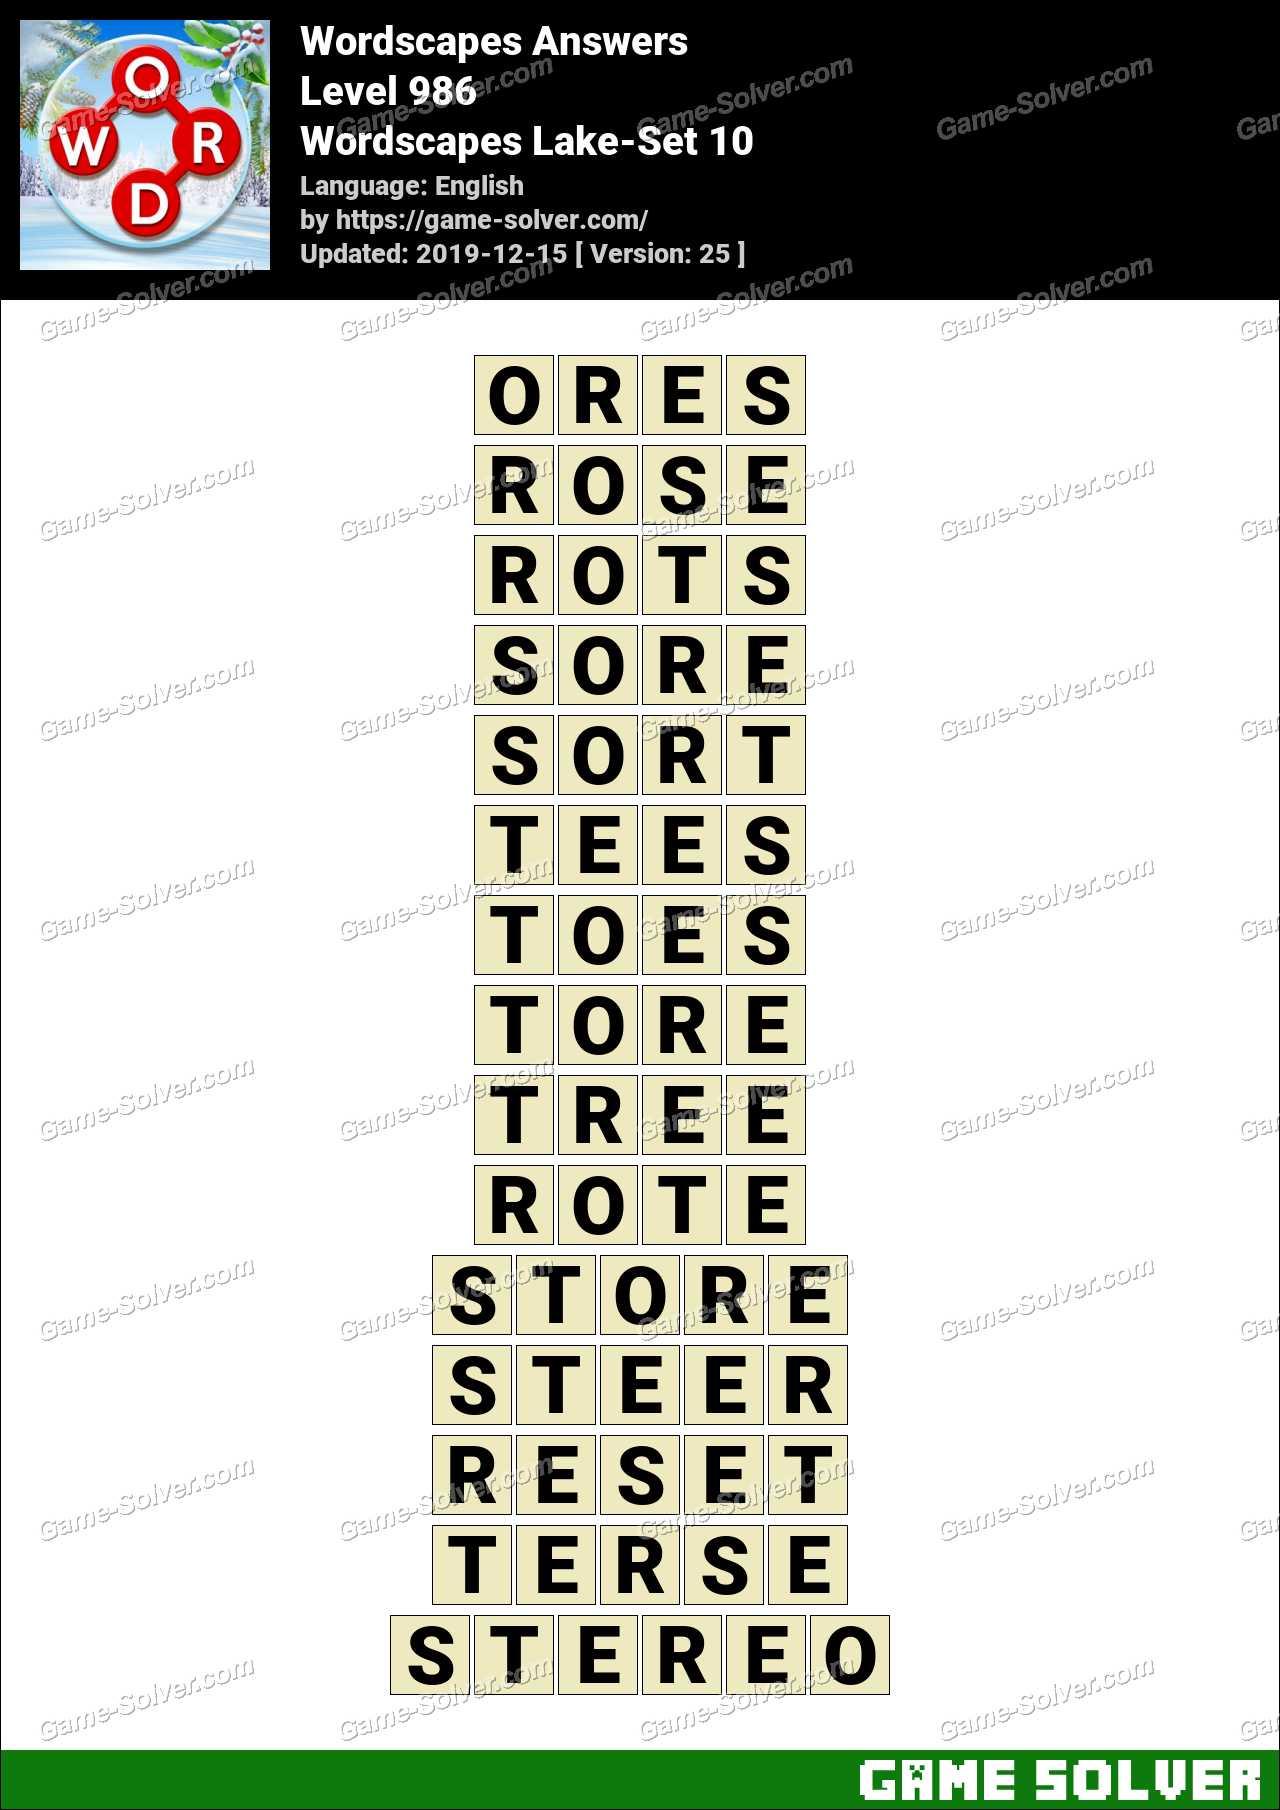 Wordscapes Lake-Set 10 Answers